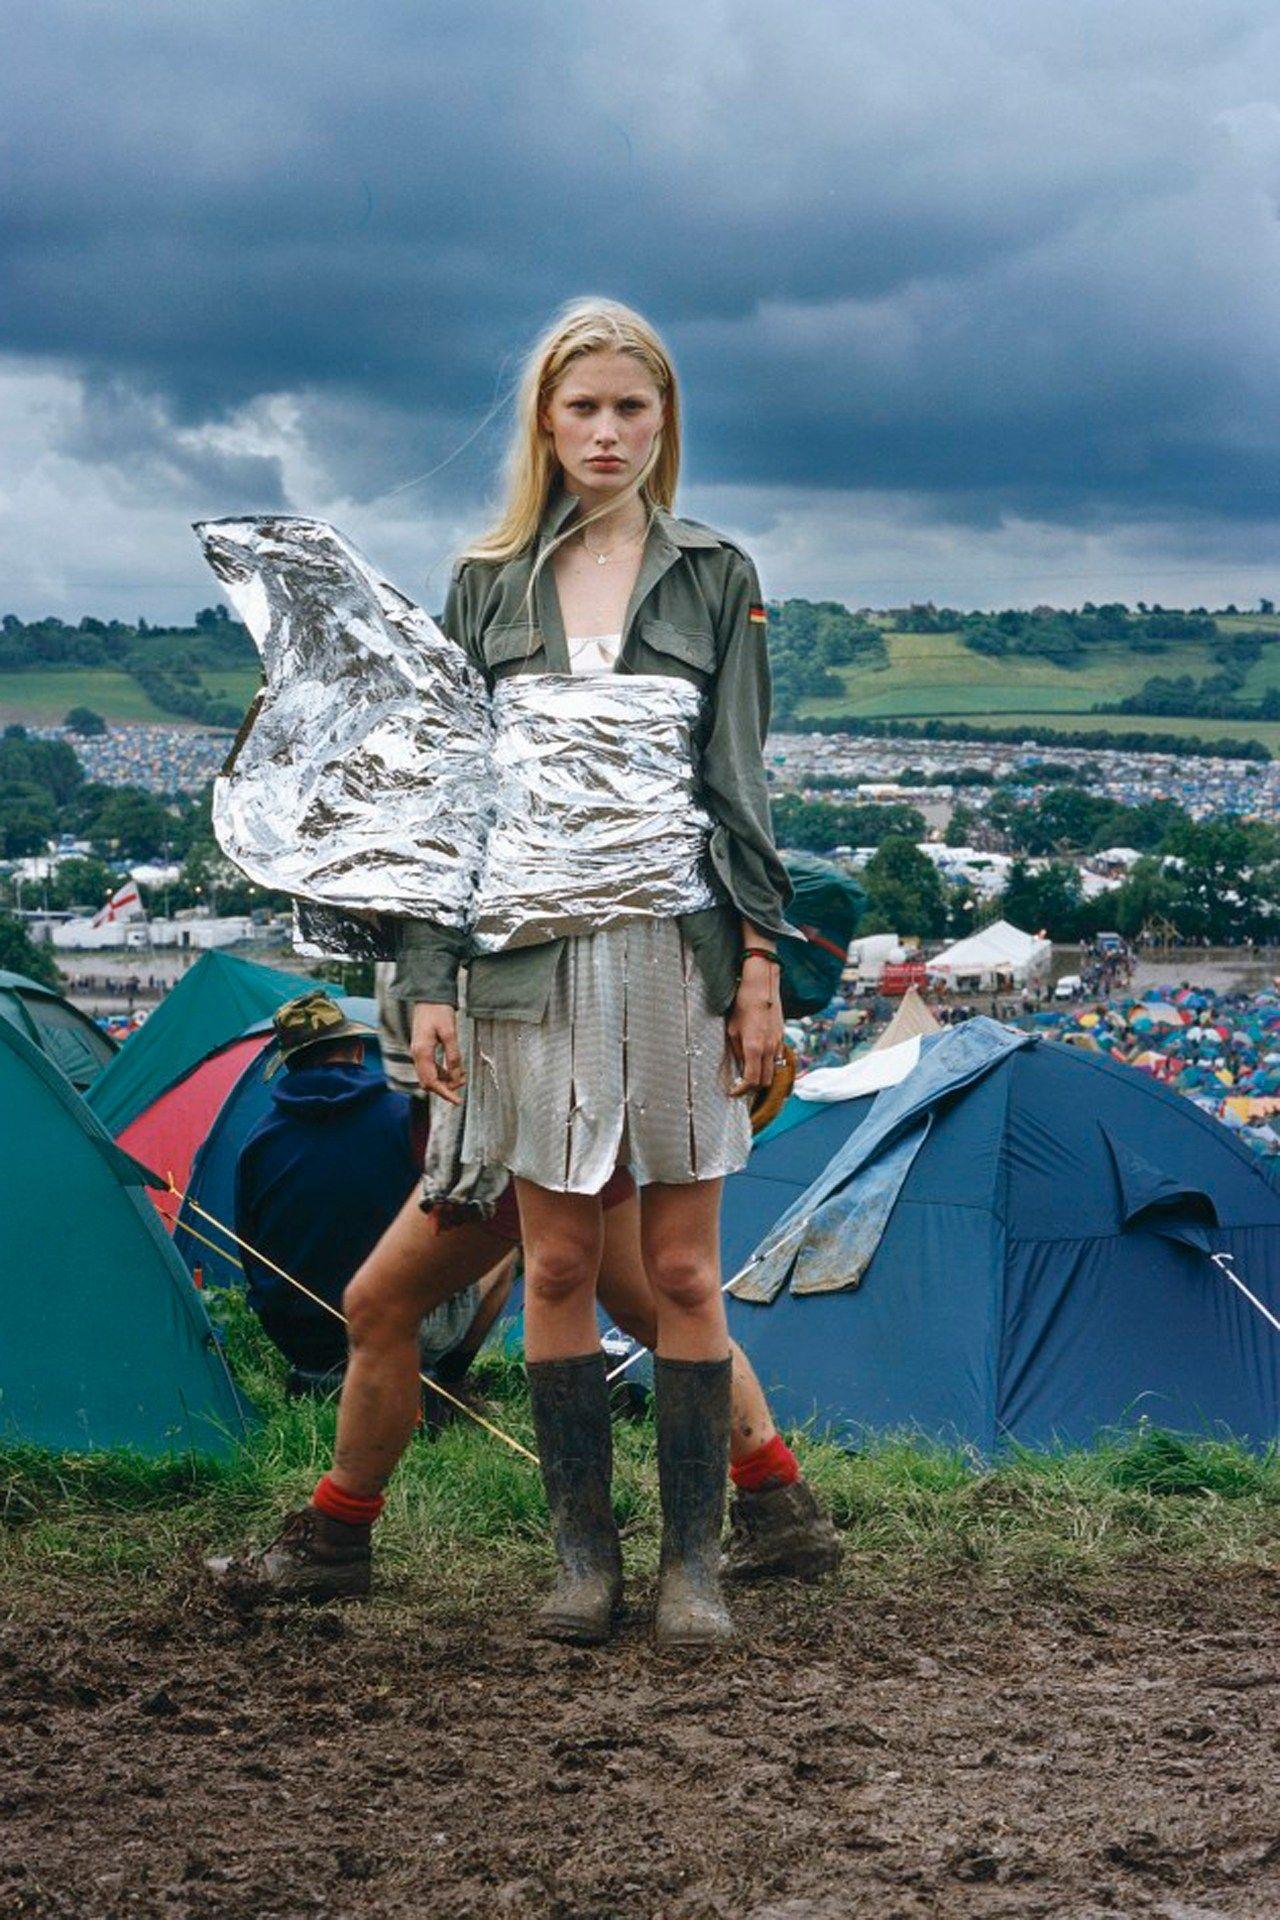 Kirsty Hume Fashion Return Comeback To Modelling (Vogue.com UK)